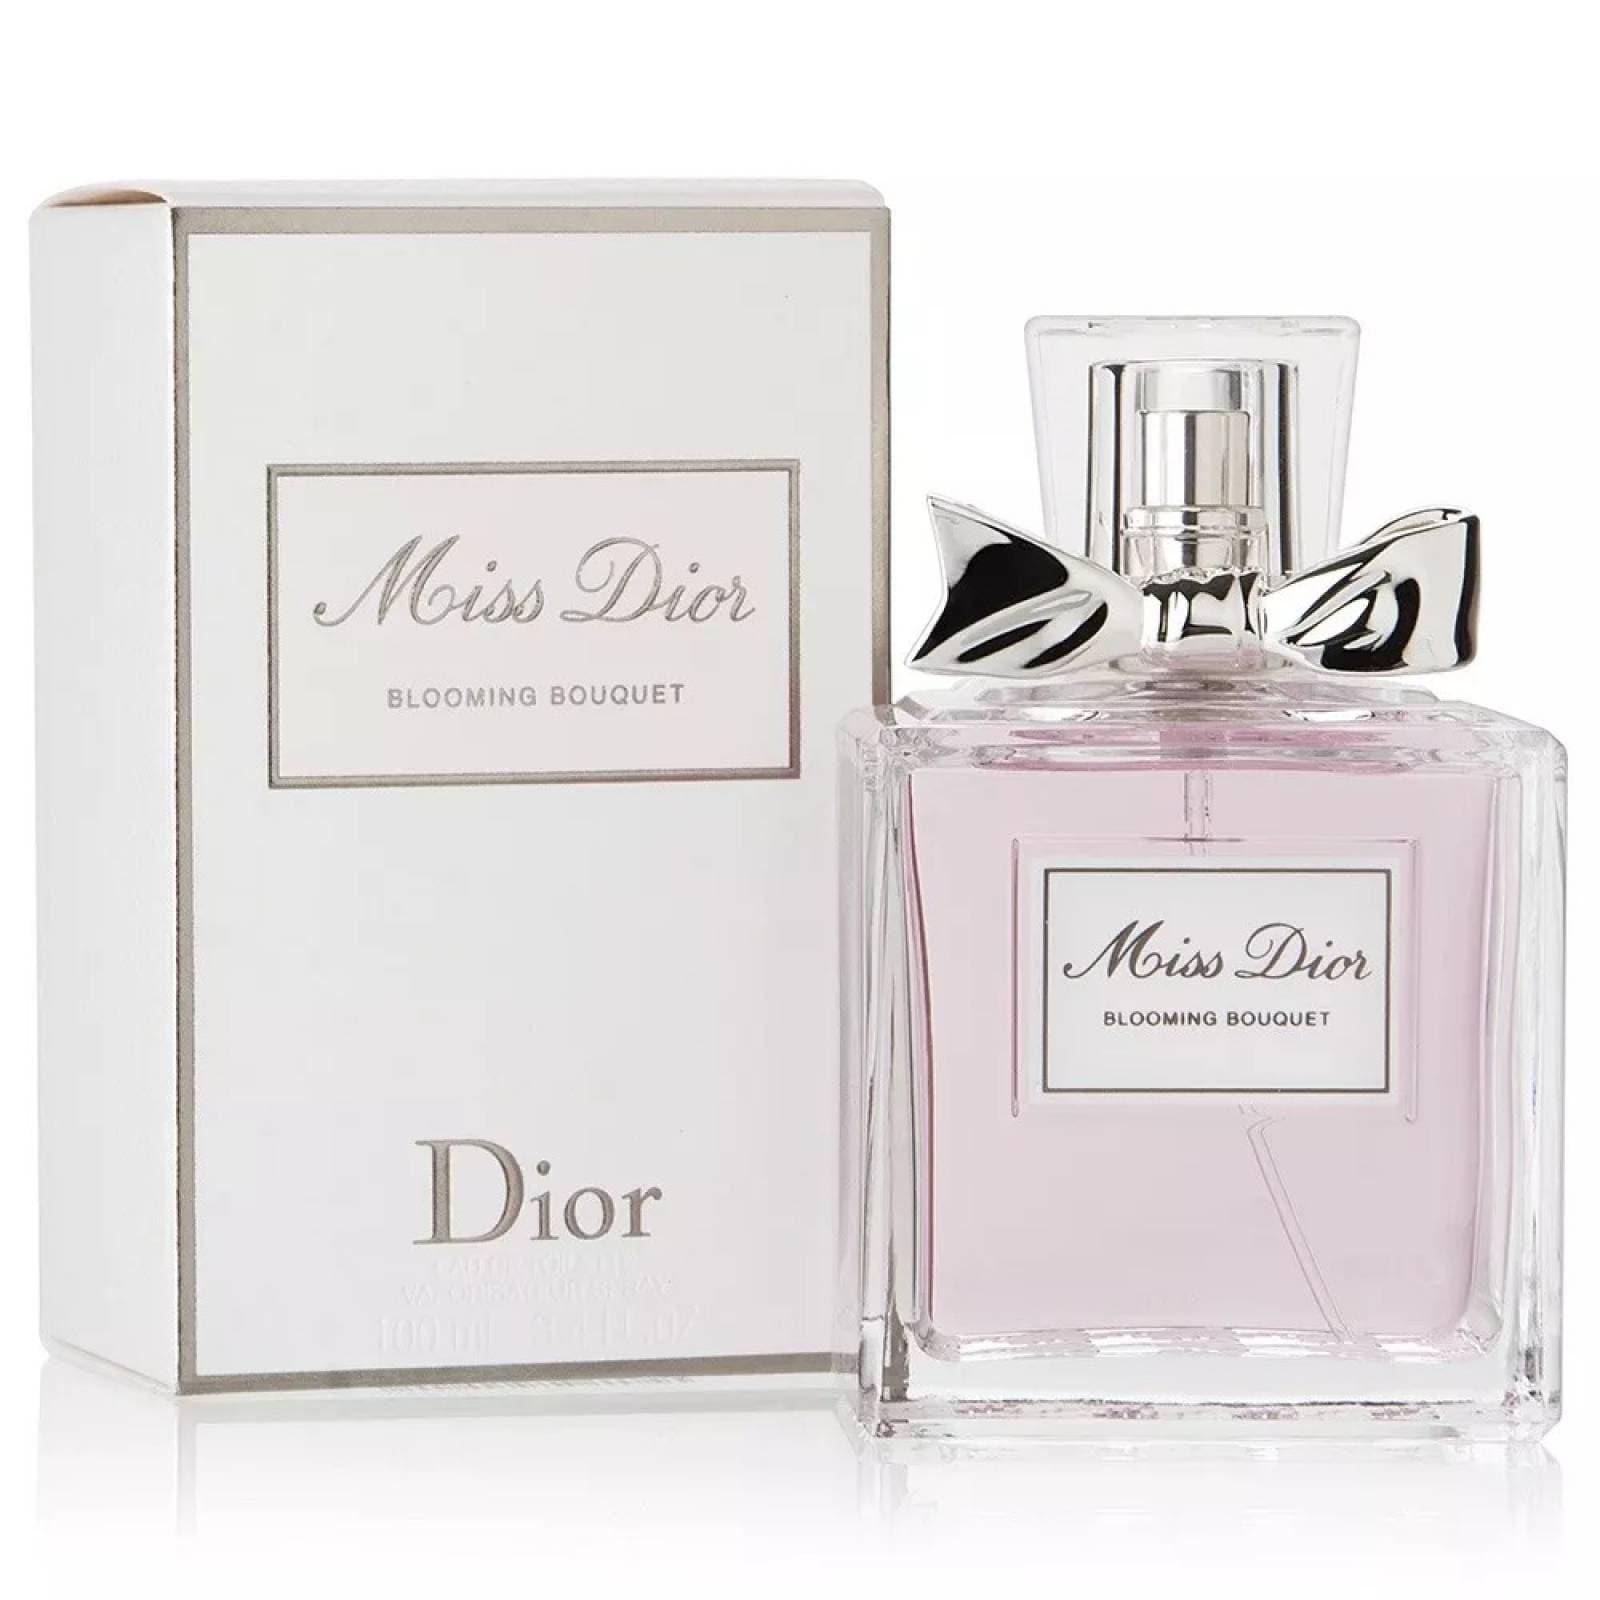 Miss Dior Blooming Bouquet De Christian Dior Edt 100 ml